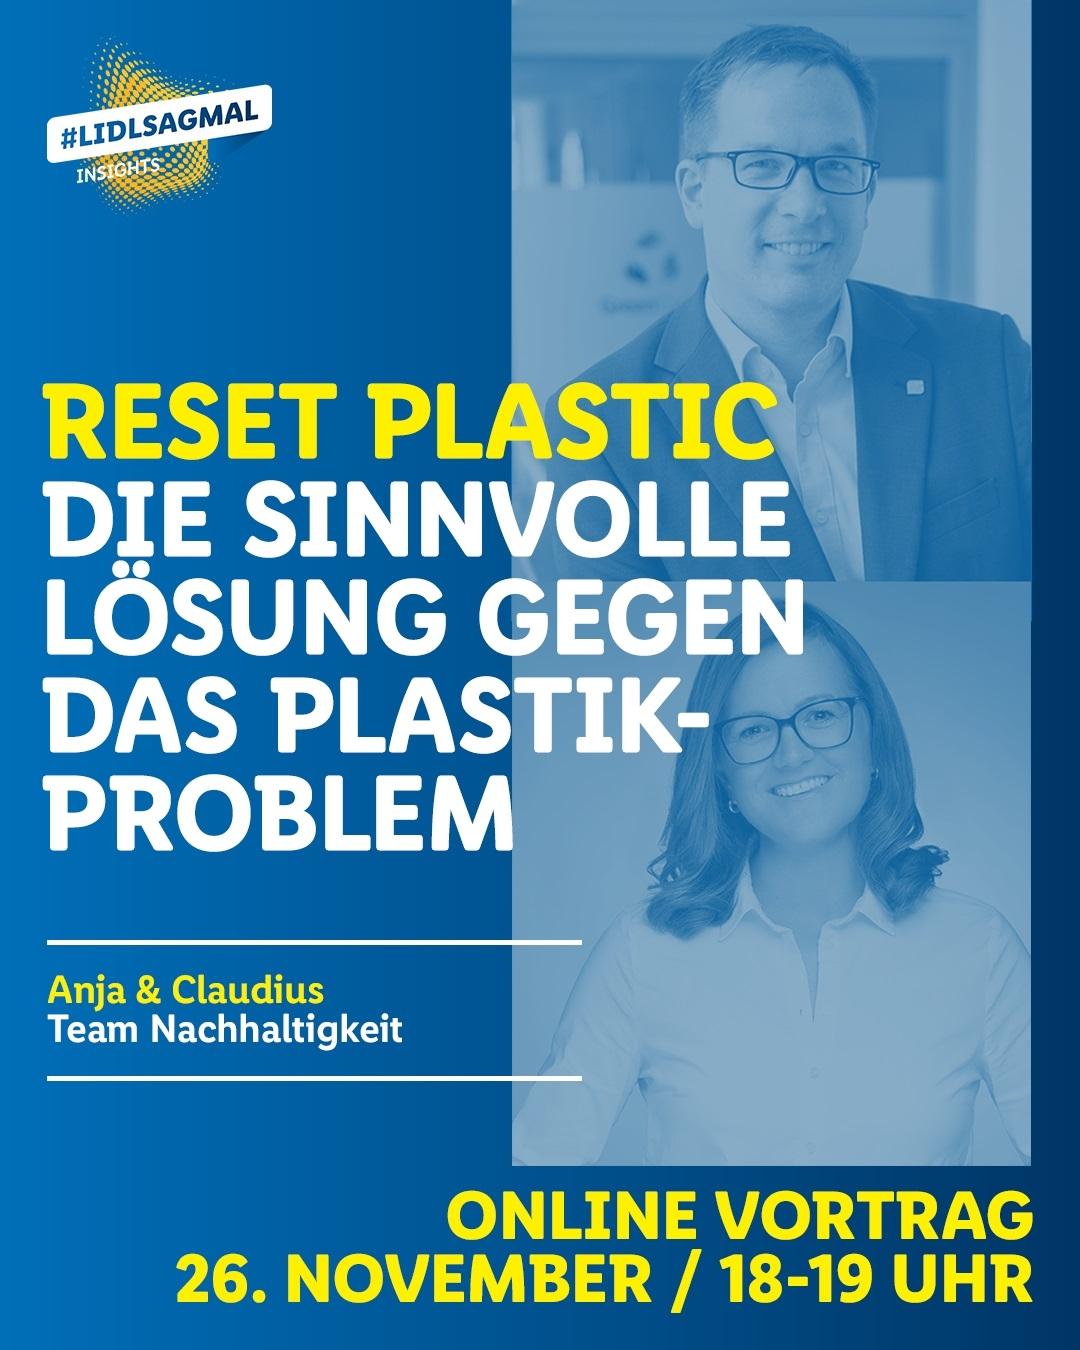 Online Vortrag Reset Plastic